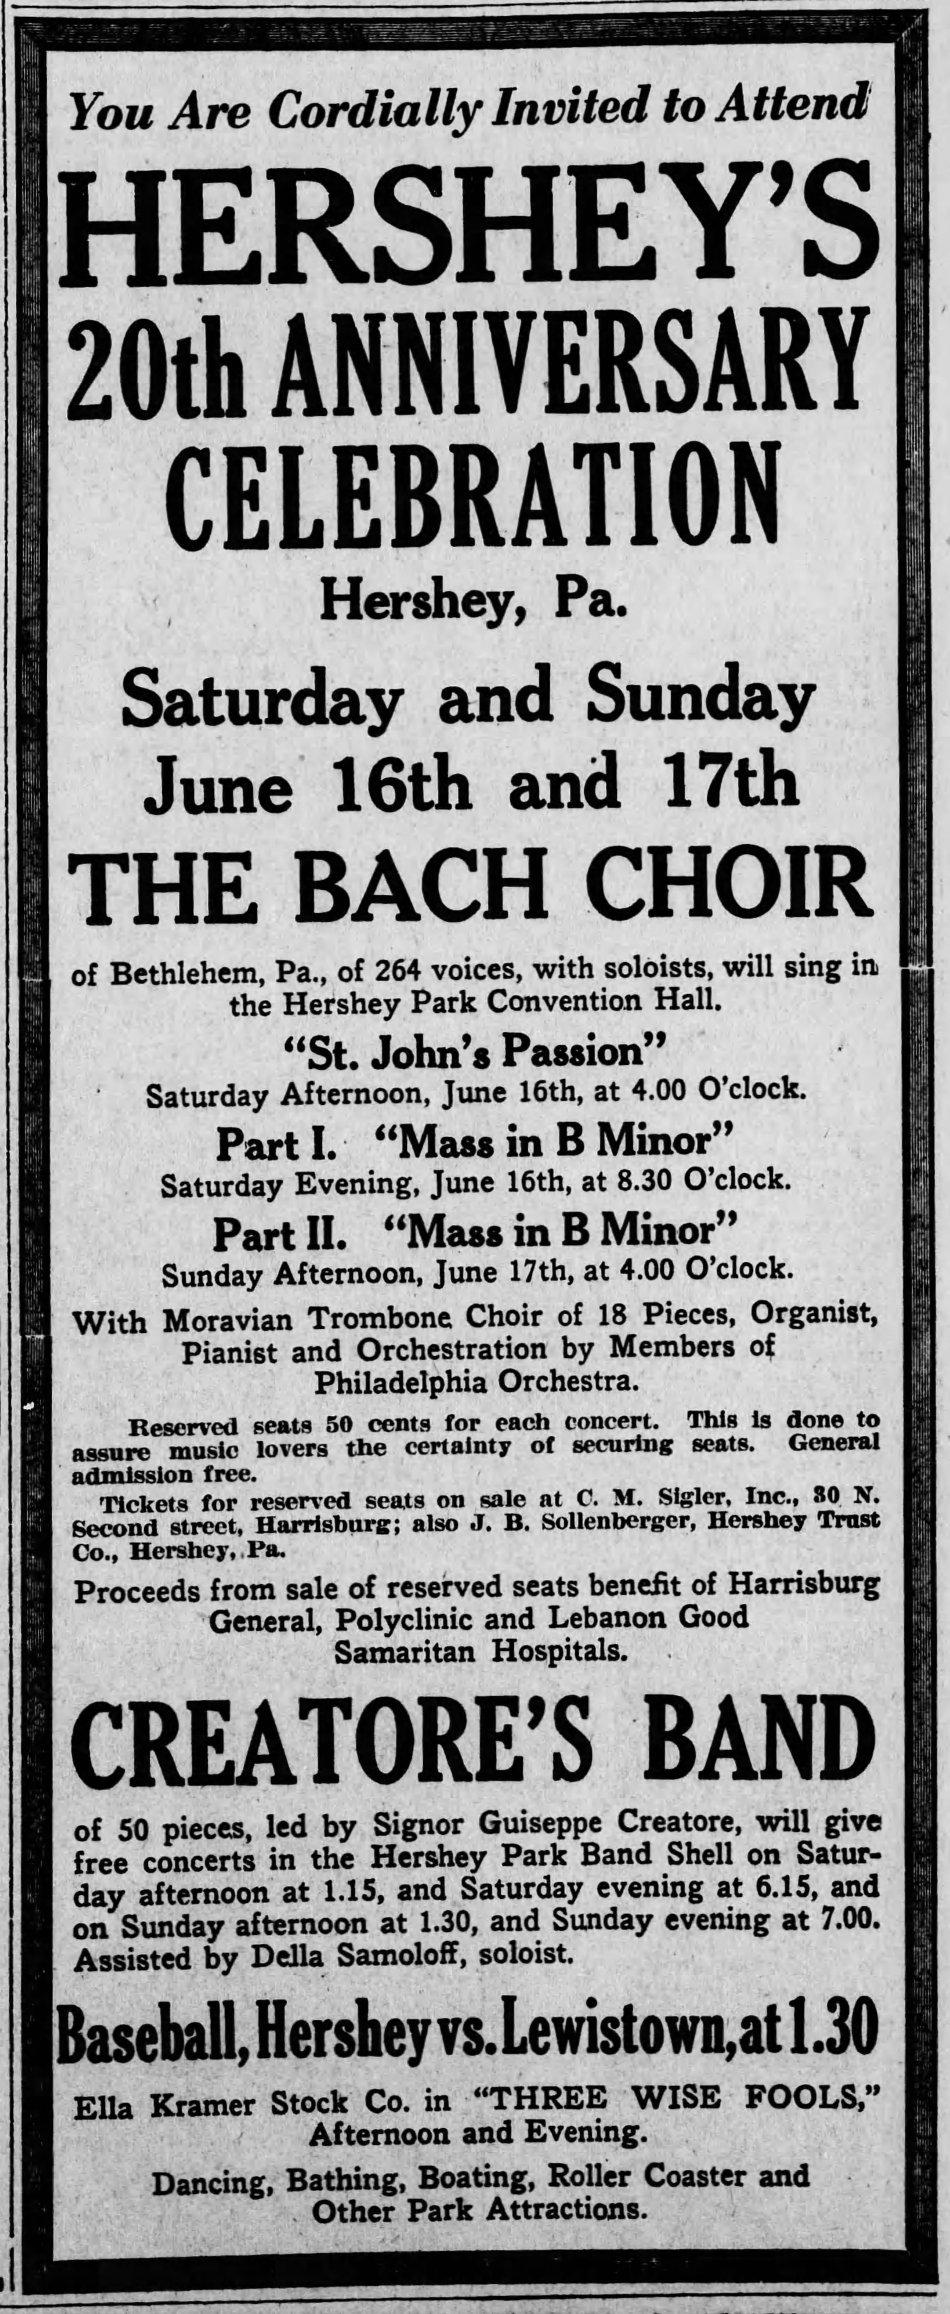 1923-06-12 Harrisburg [PA] Telegraph (p14)